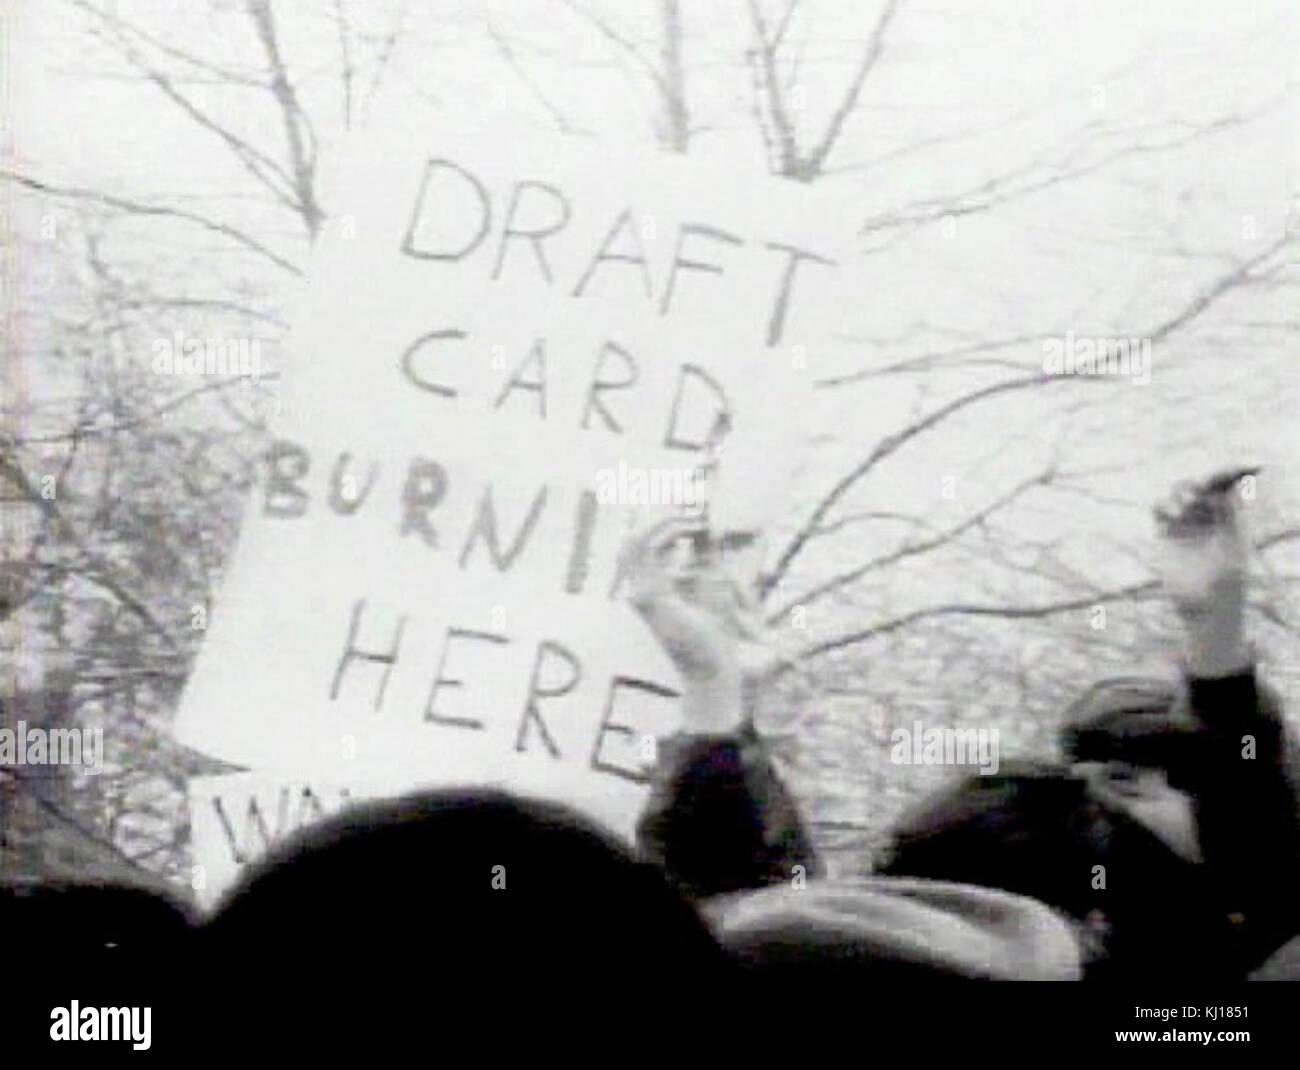 Draft card burning NYC 1967 - Stock Image